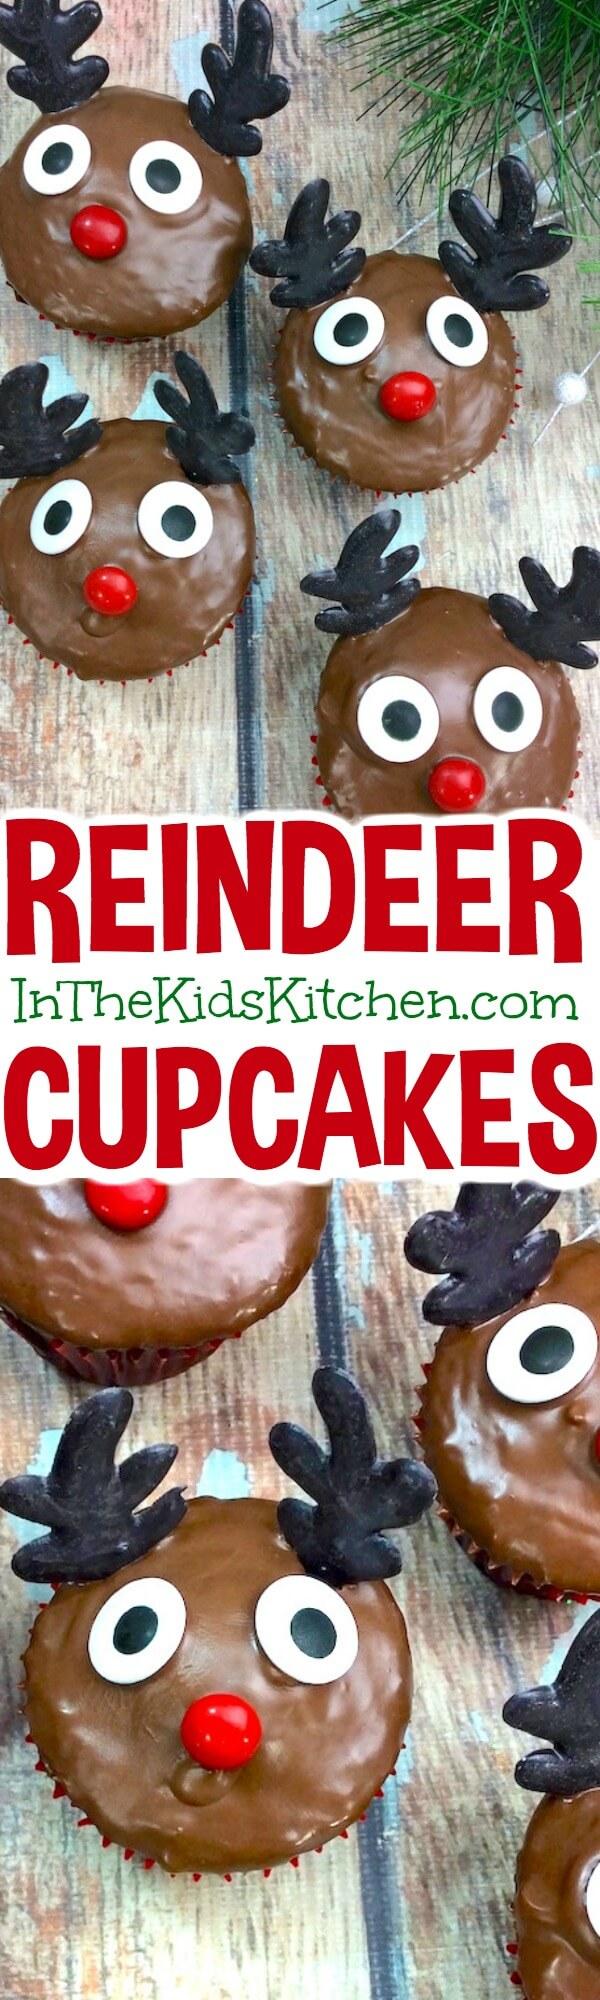 Easy Rudolph Reindeer Cupcakes #Christmas #cupcakes